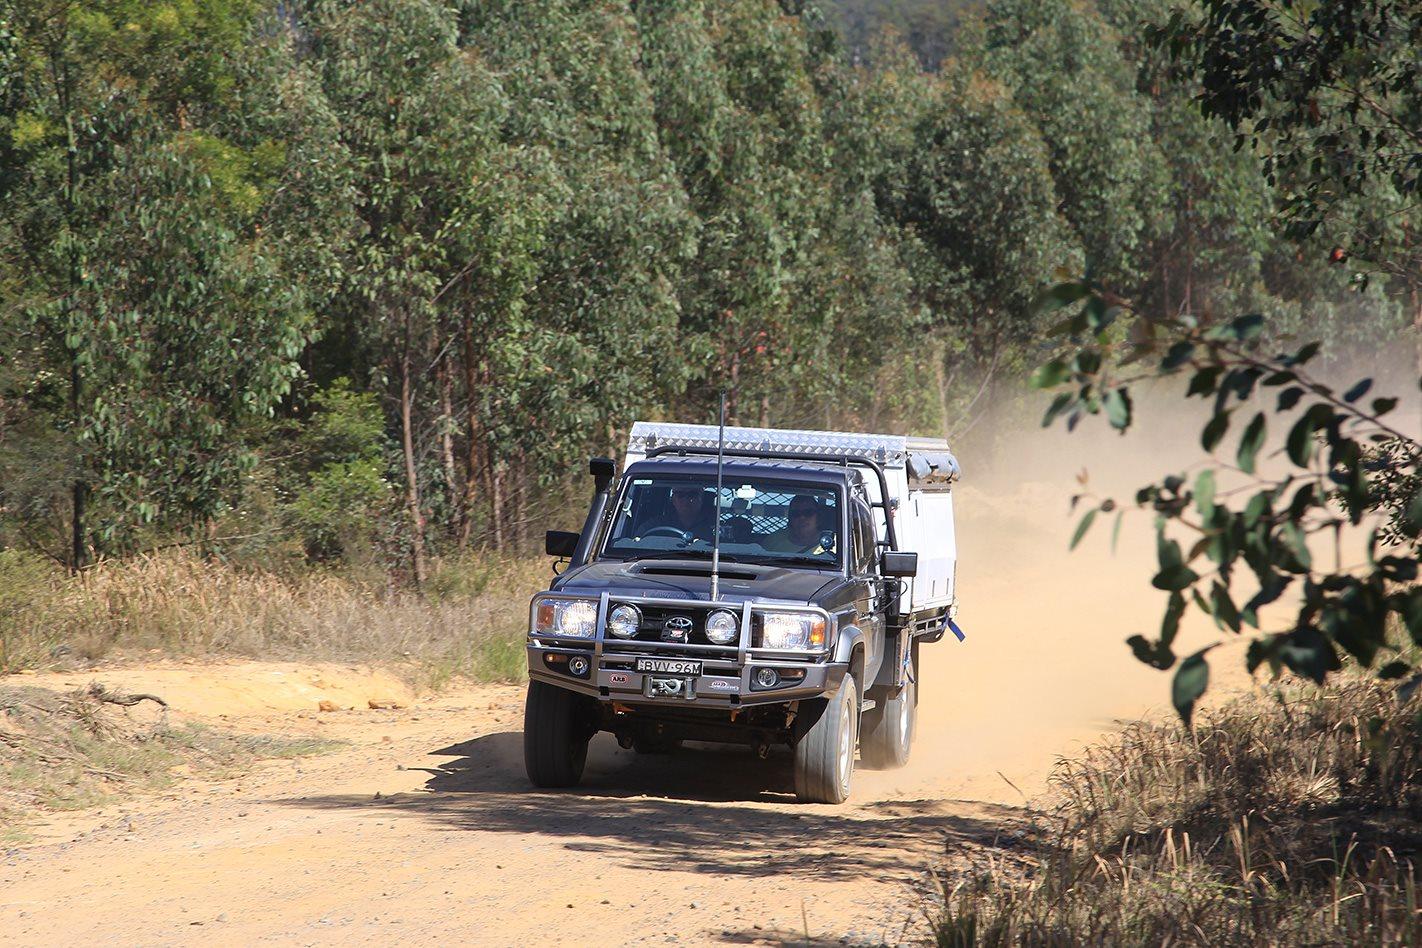 2011 Toyota 79 Series Land Cruiser GX custom dirt roads